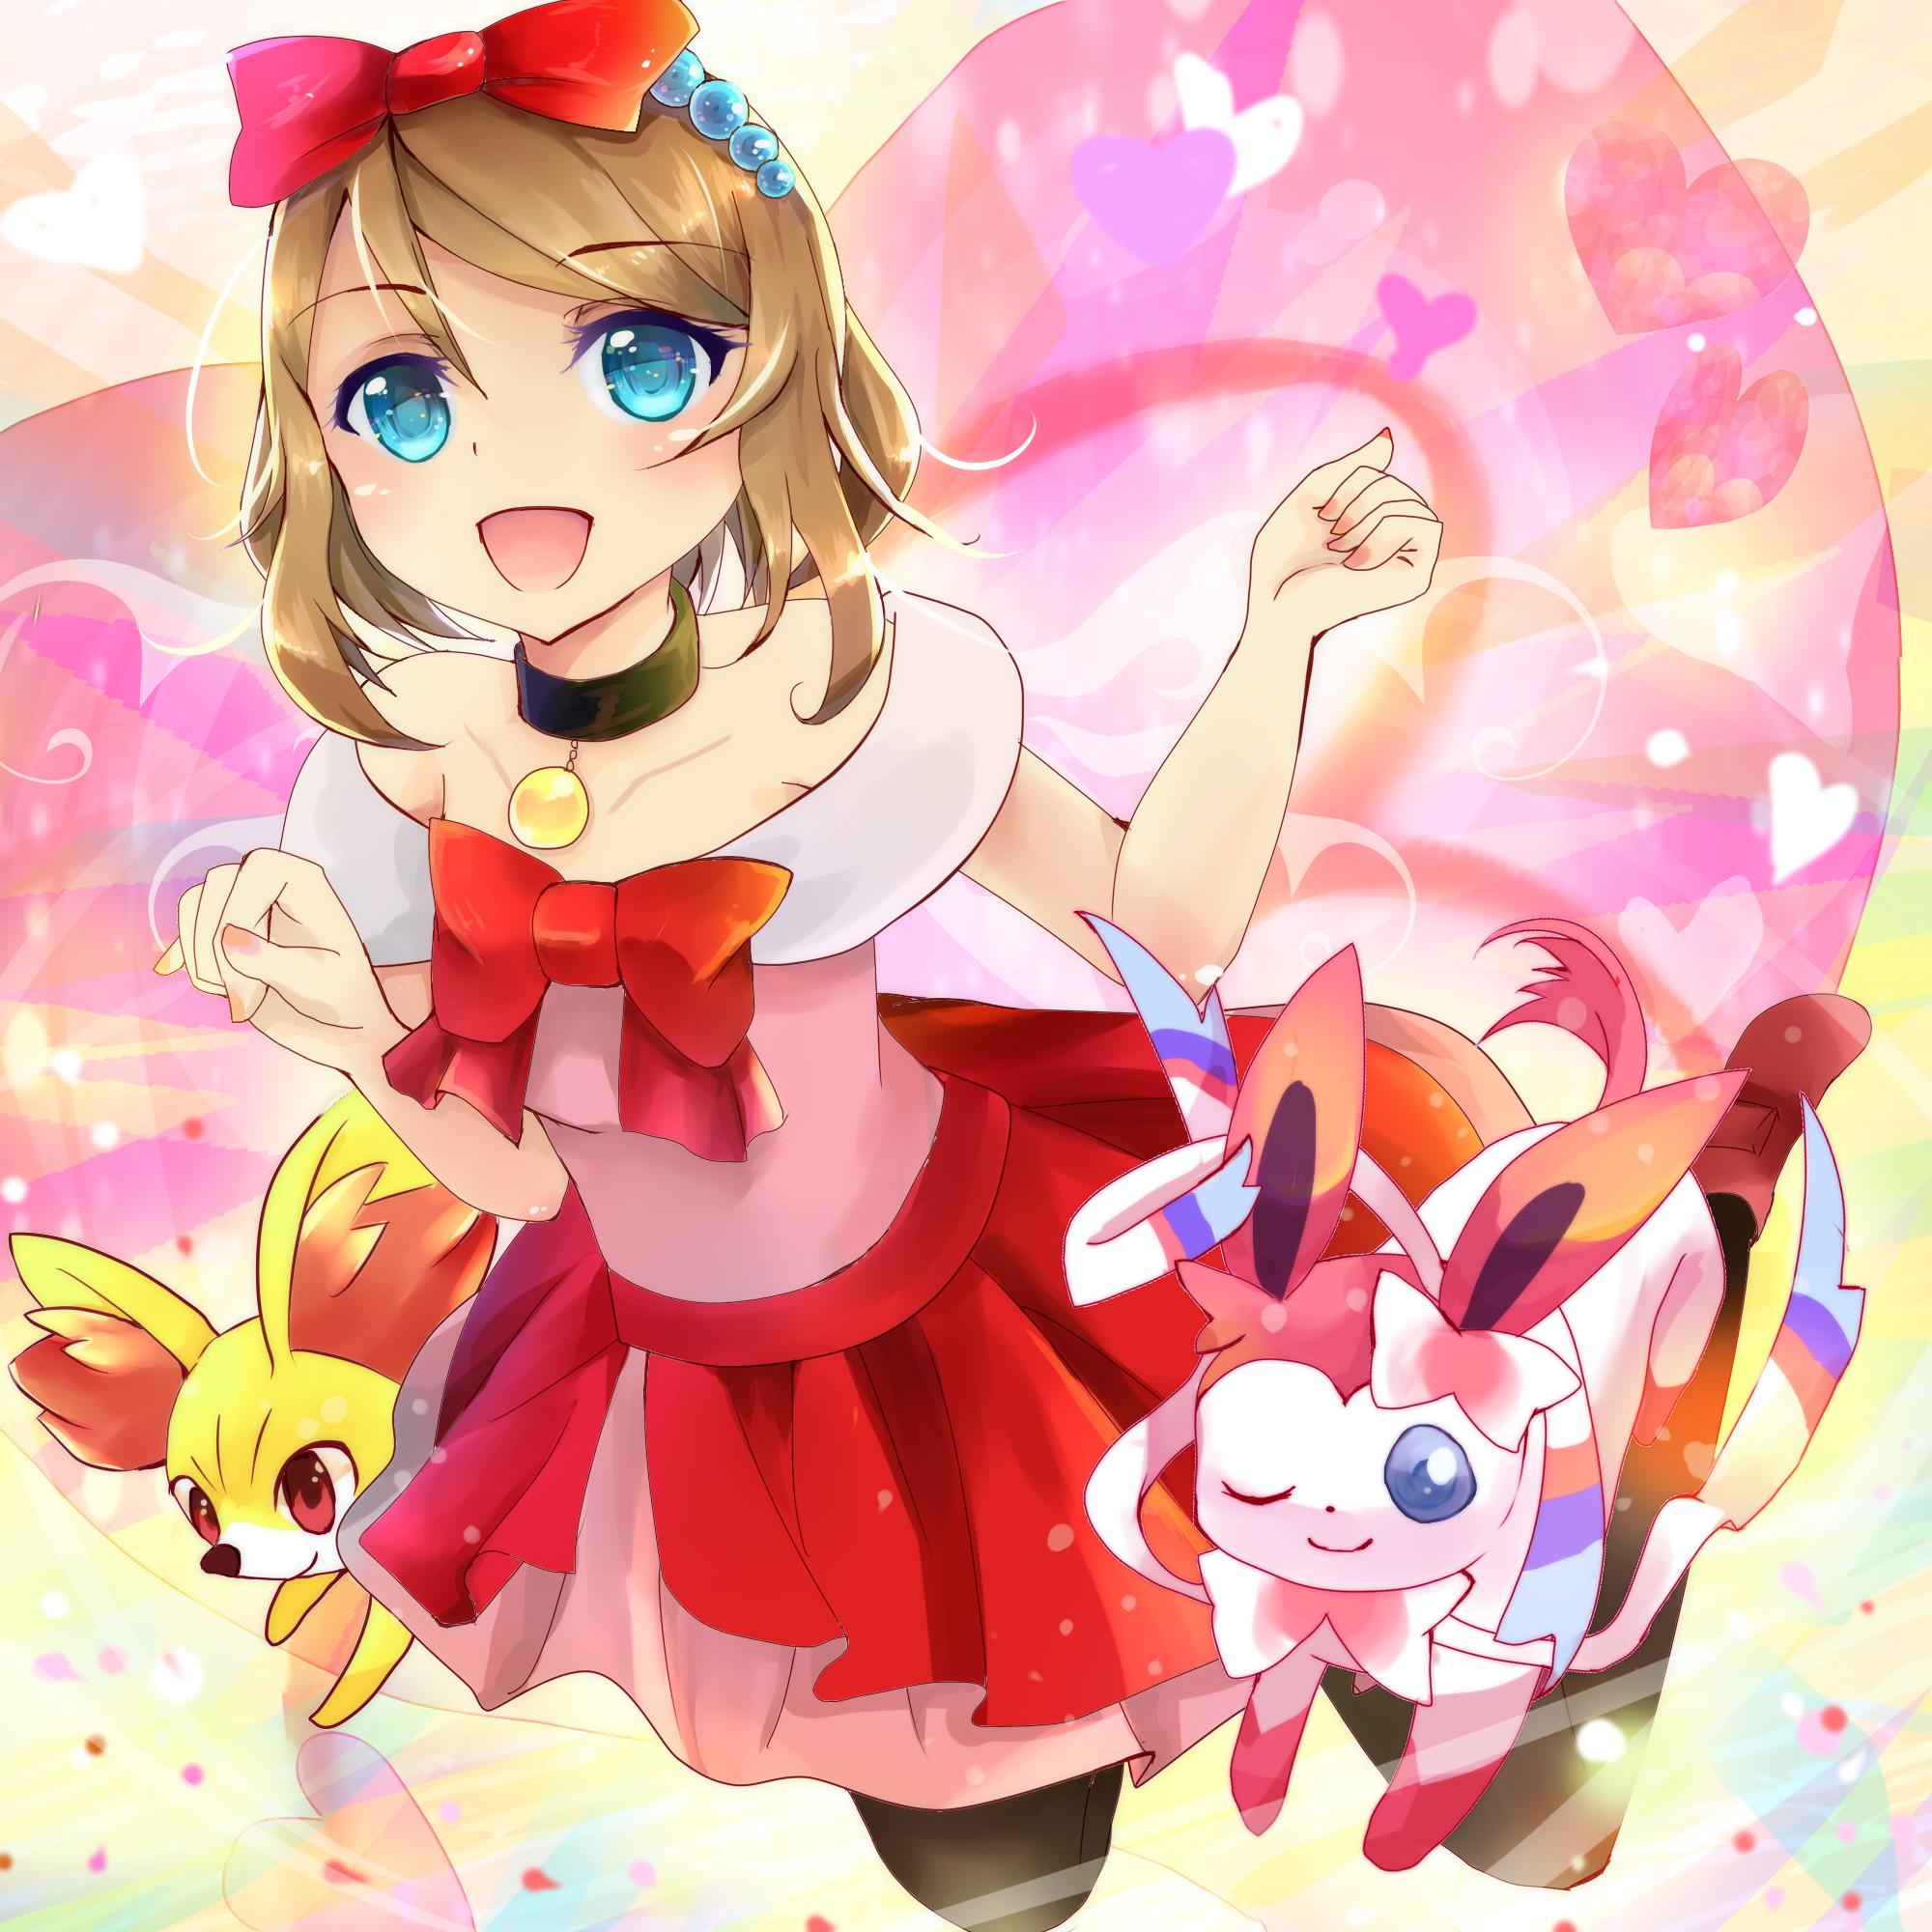 Pokemon VGGTS pics - Page 4 |Pokemon Serena Gts